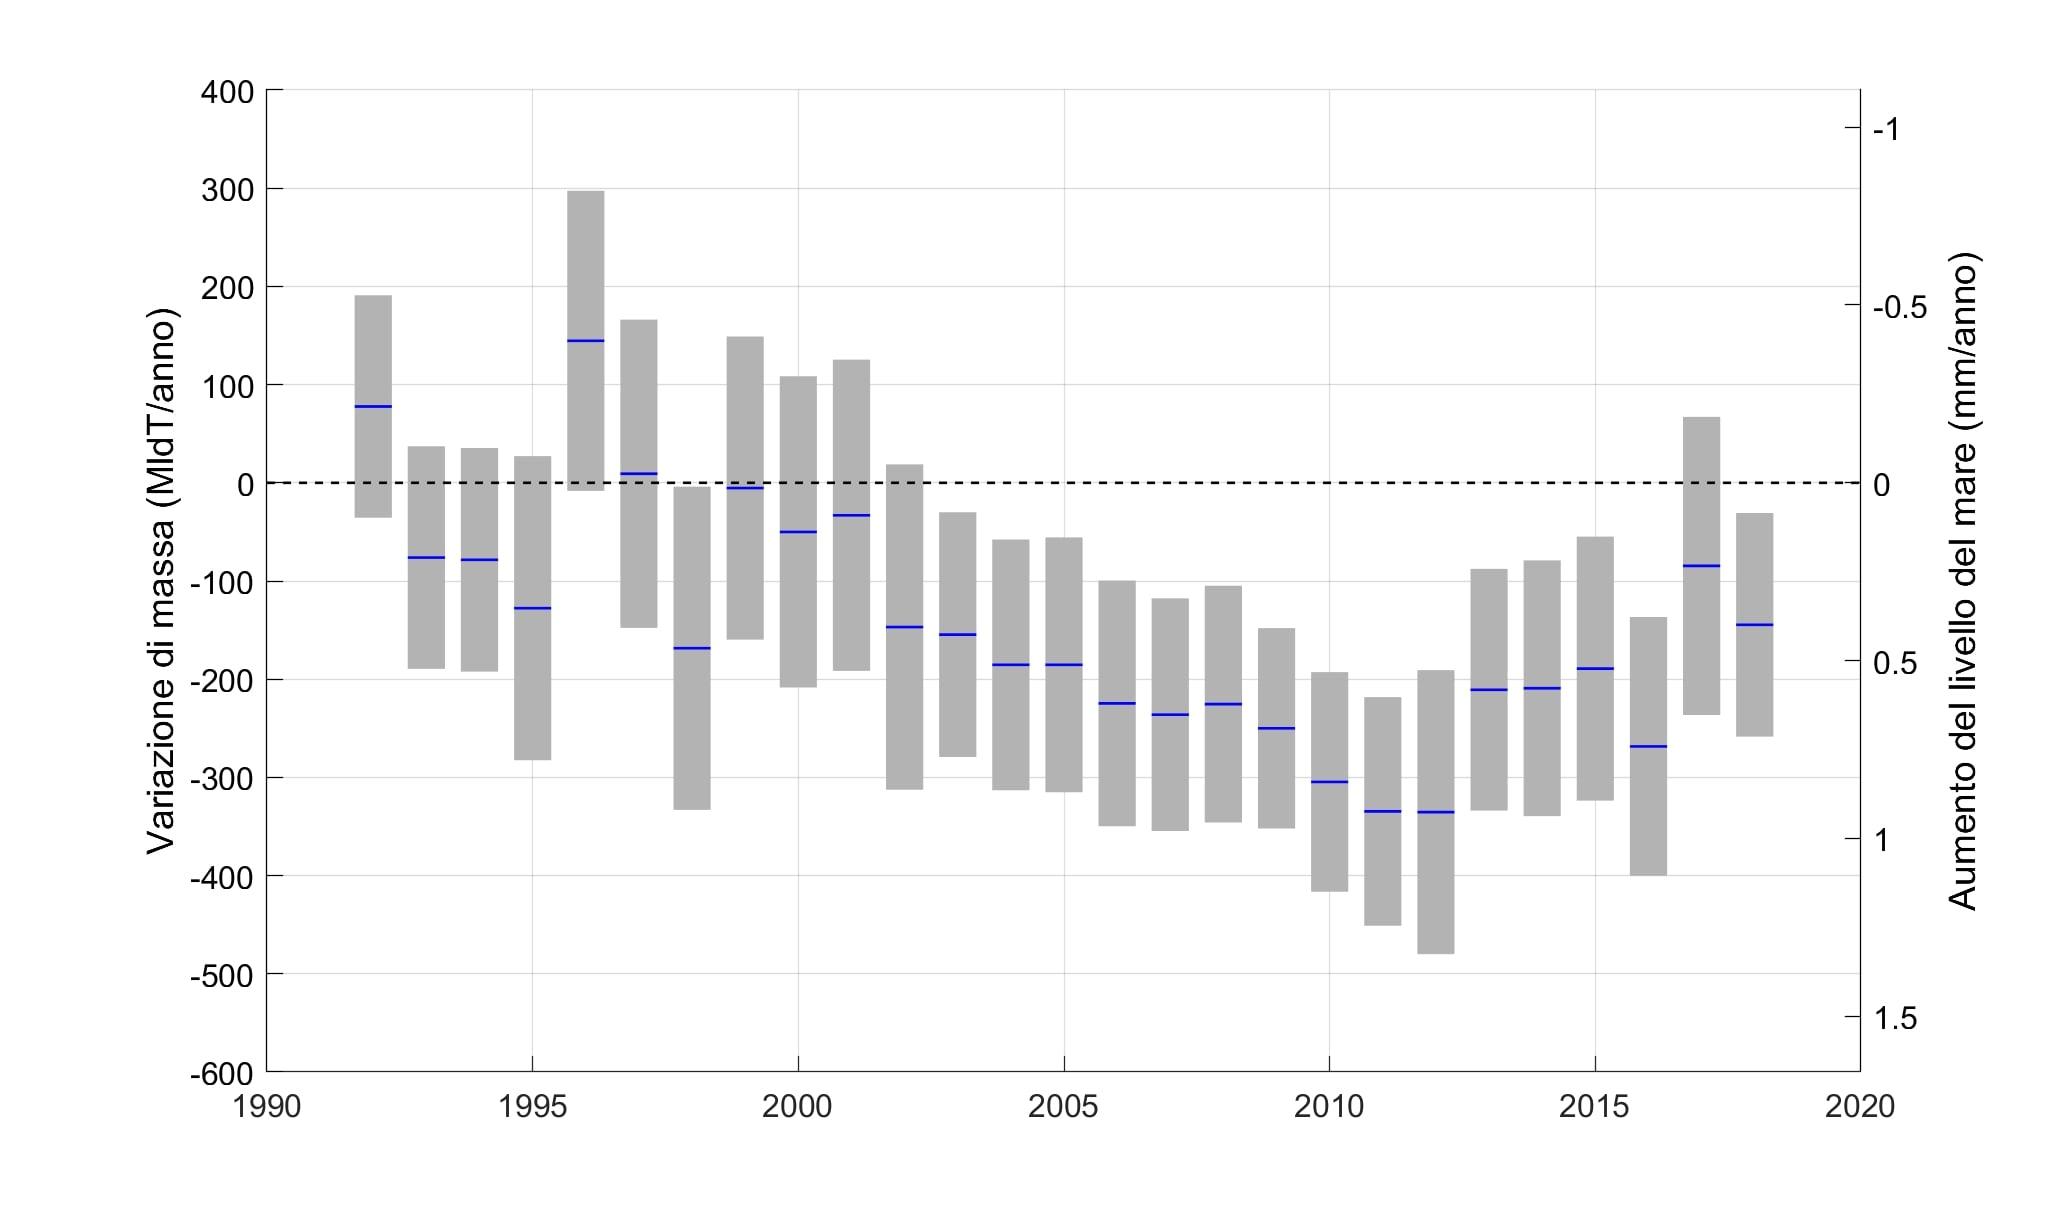 cs tasso annuale di variazione